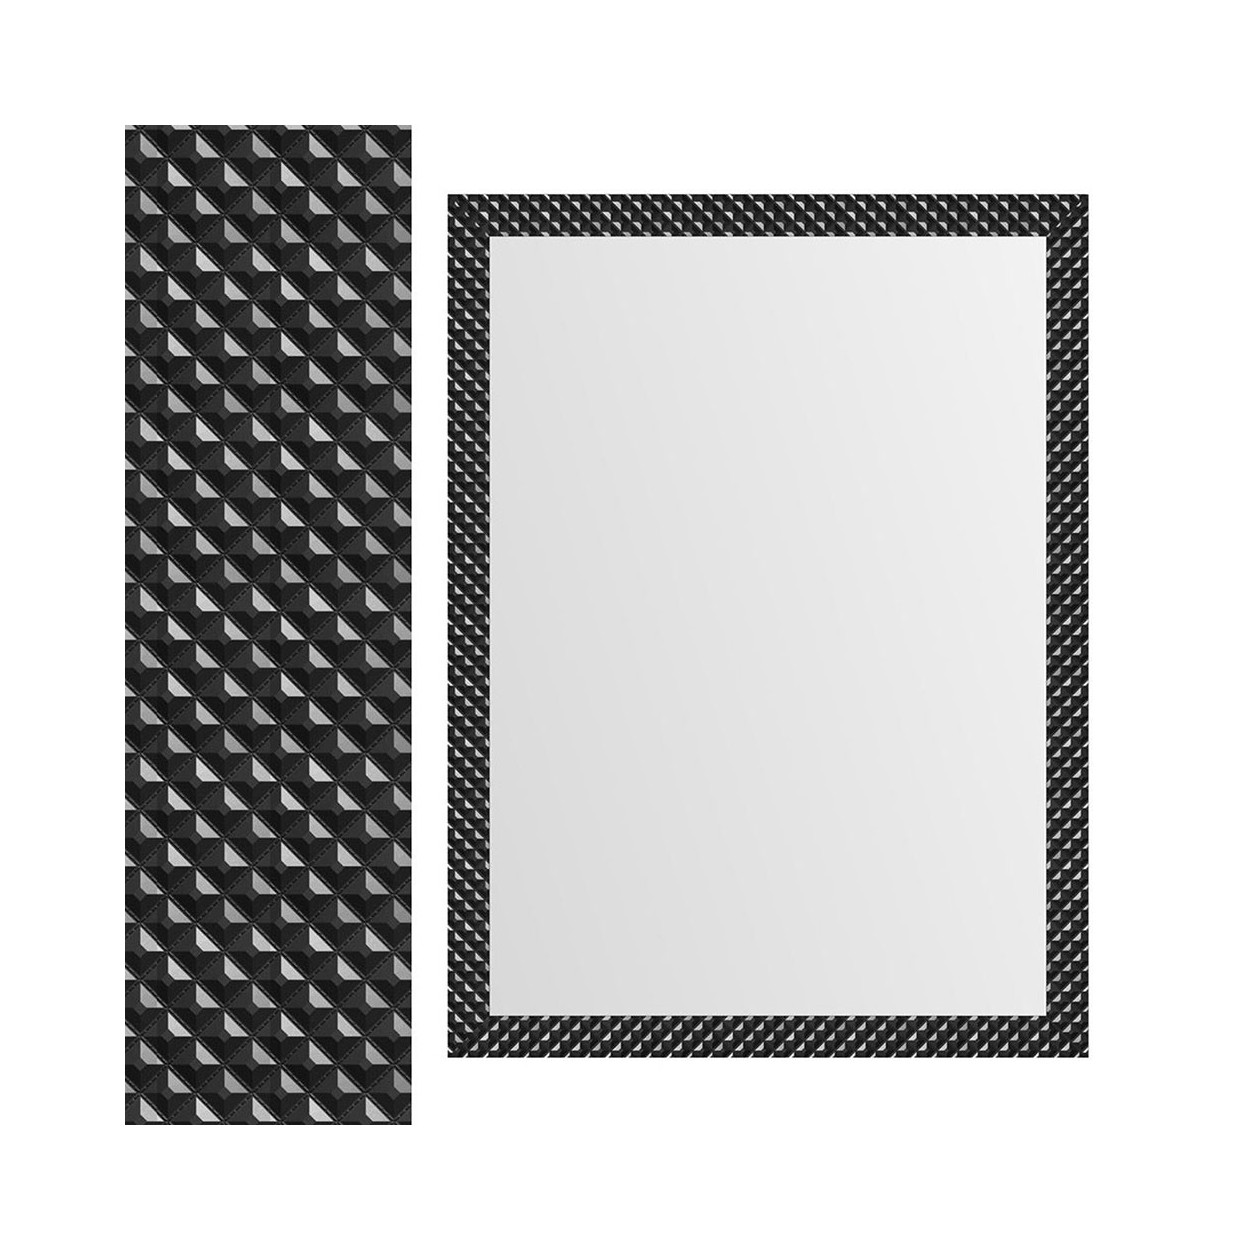 Espejo de pared negro con formas geom tricas dise o for Espejos de formas